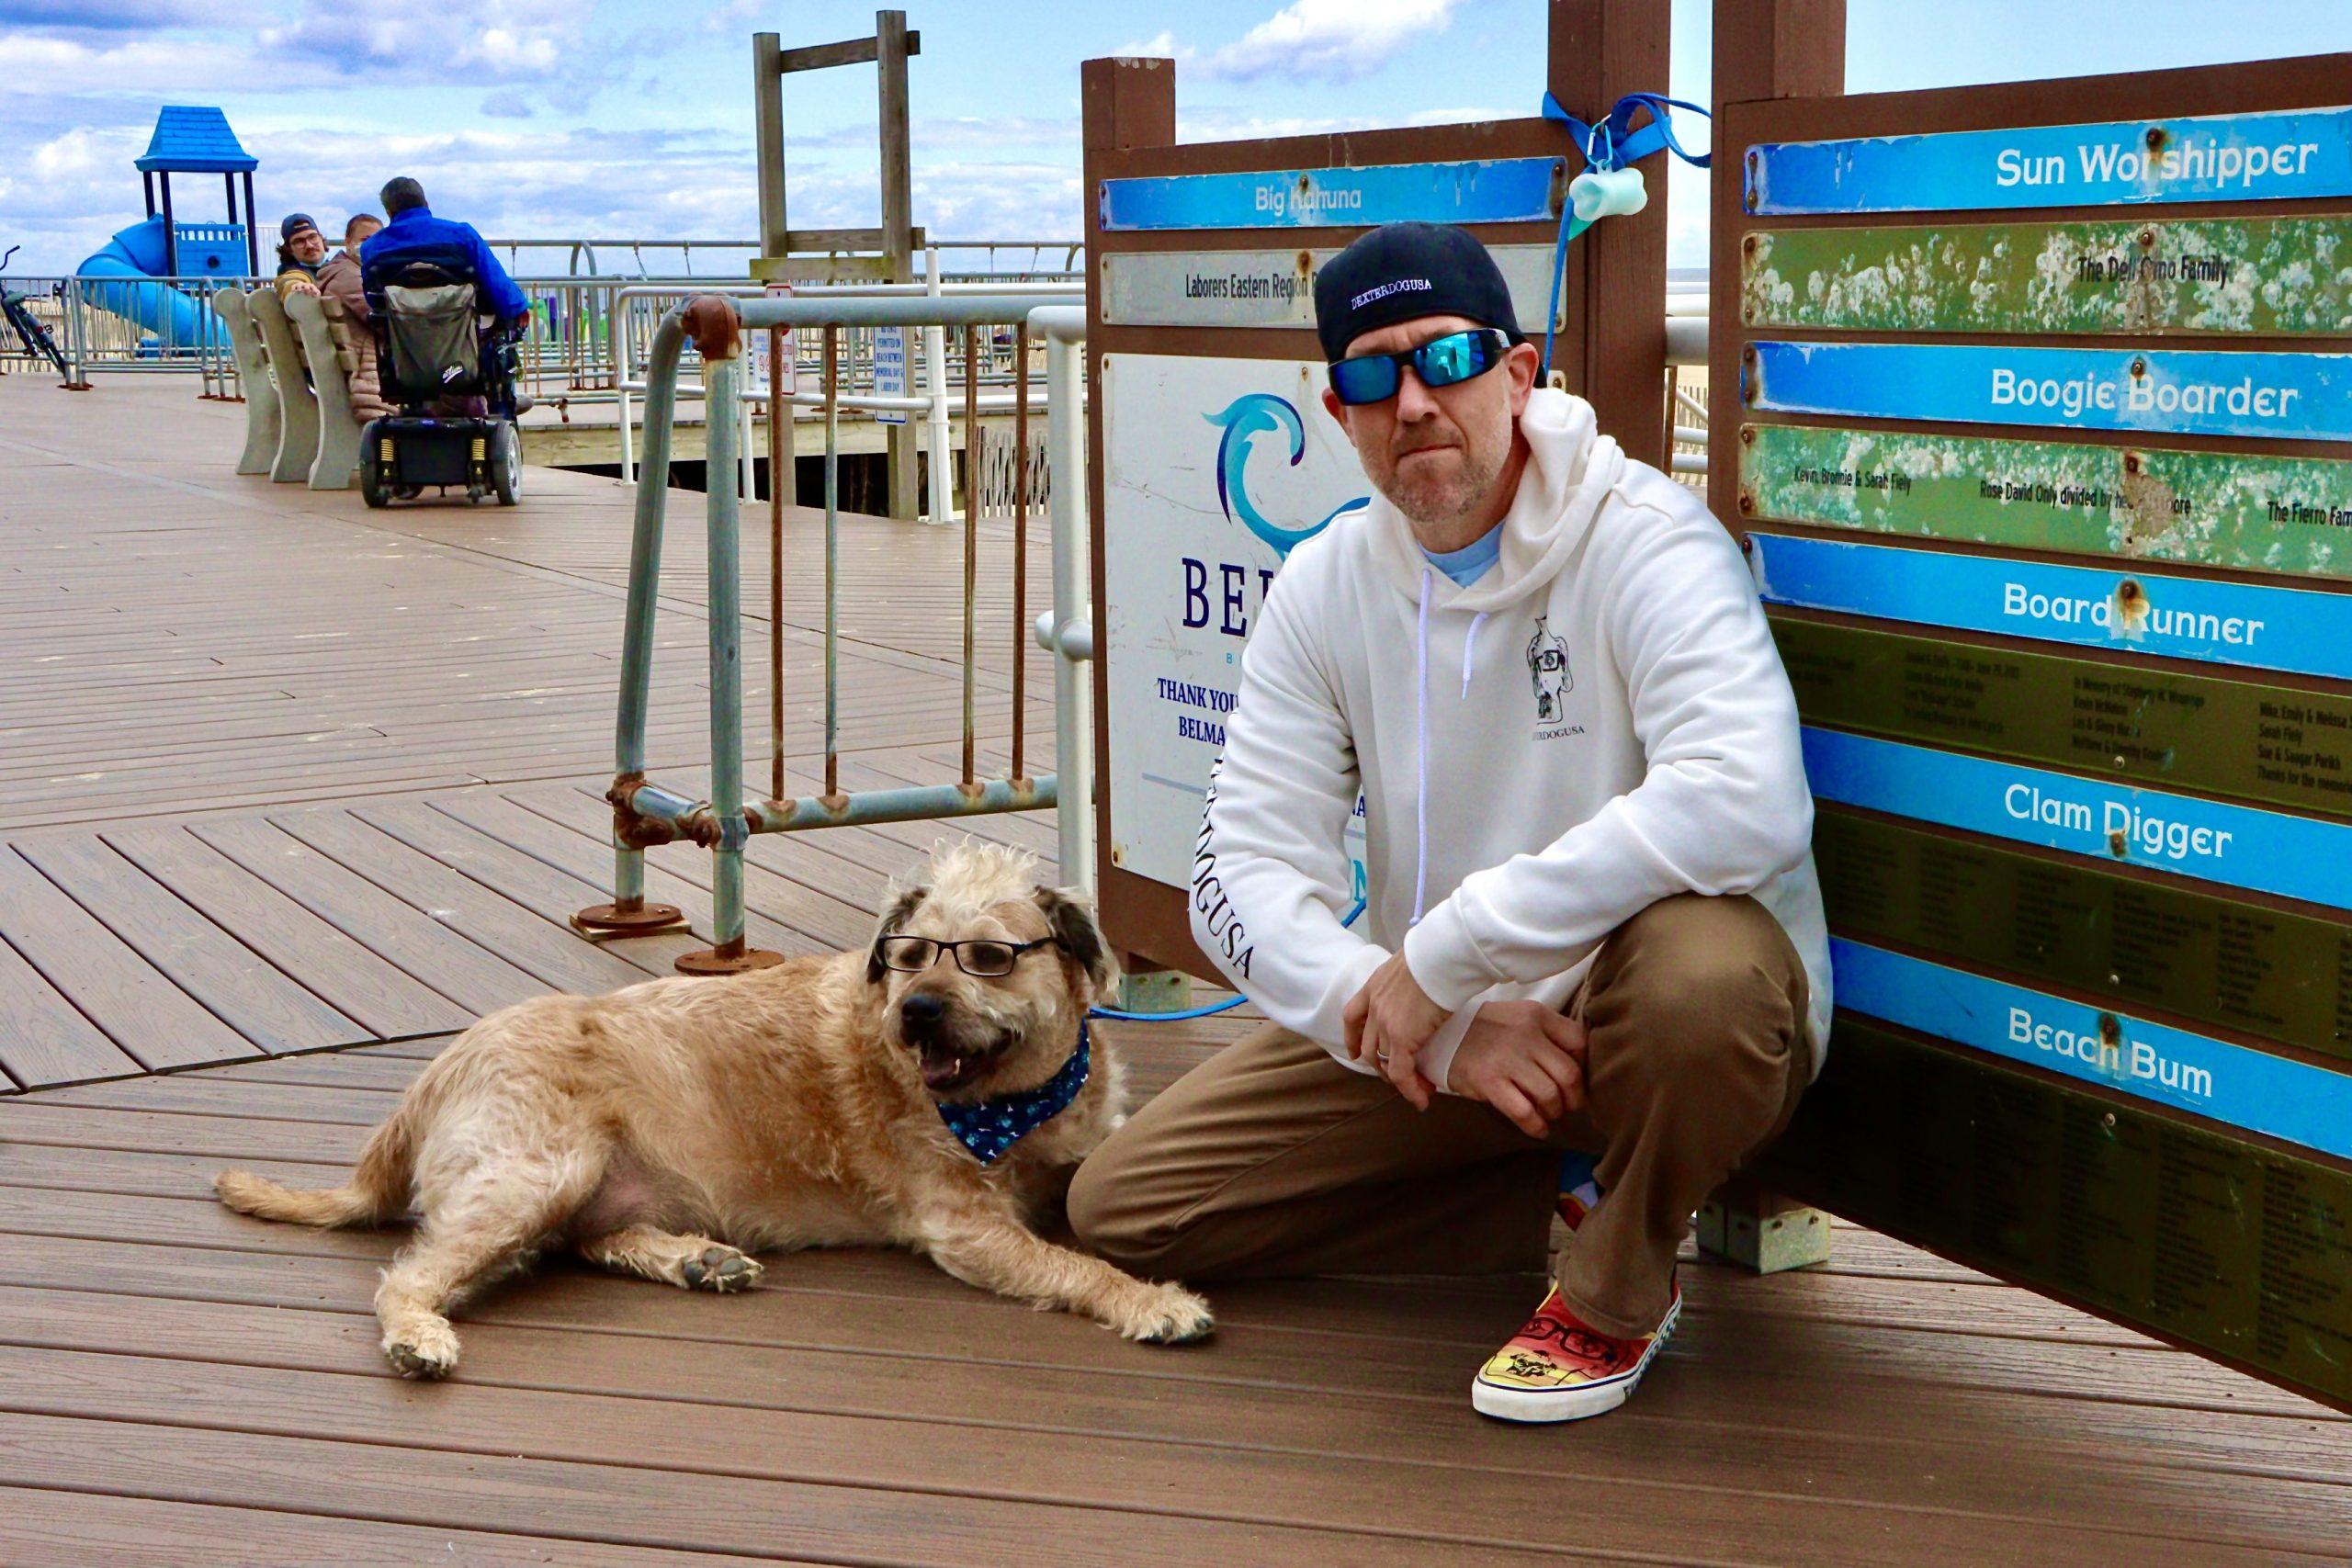 Owner of Dexter Dog and Dexter on Belmar Boardwalk